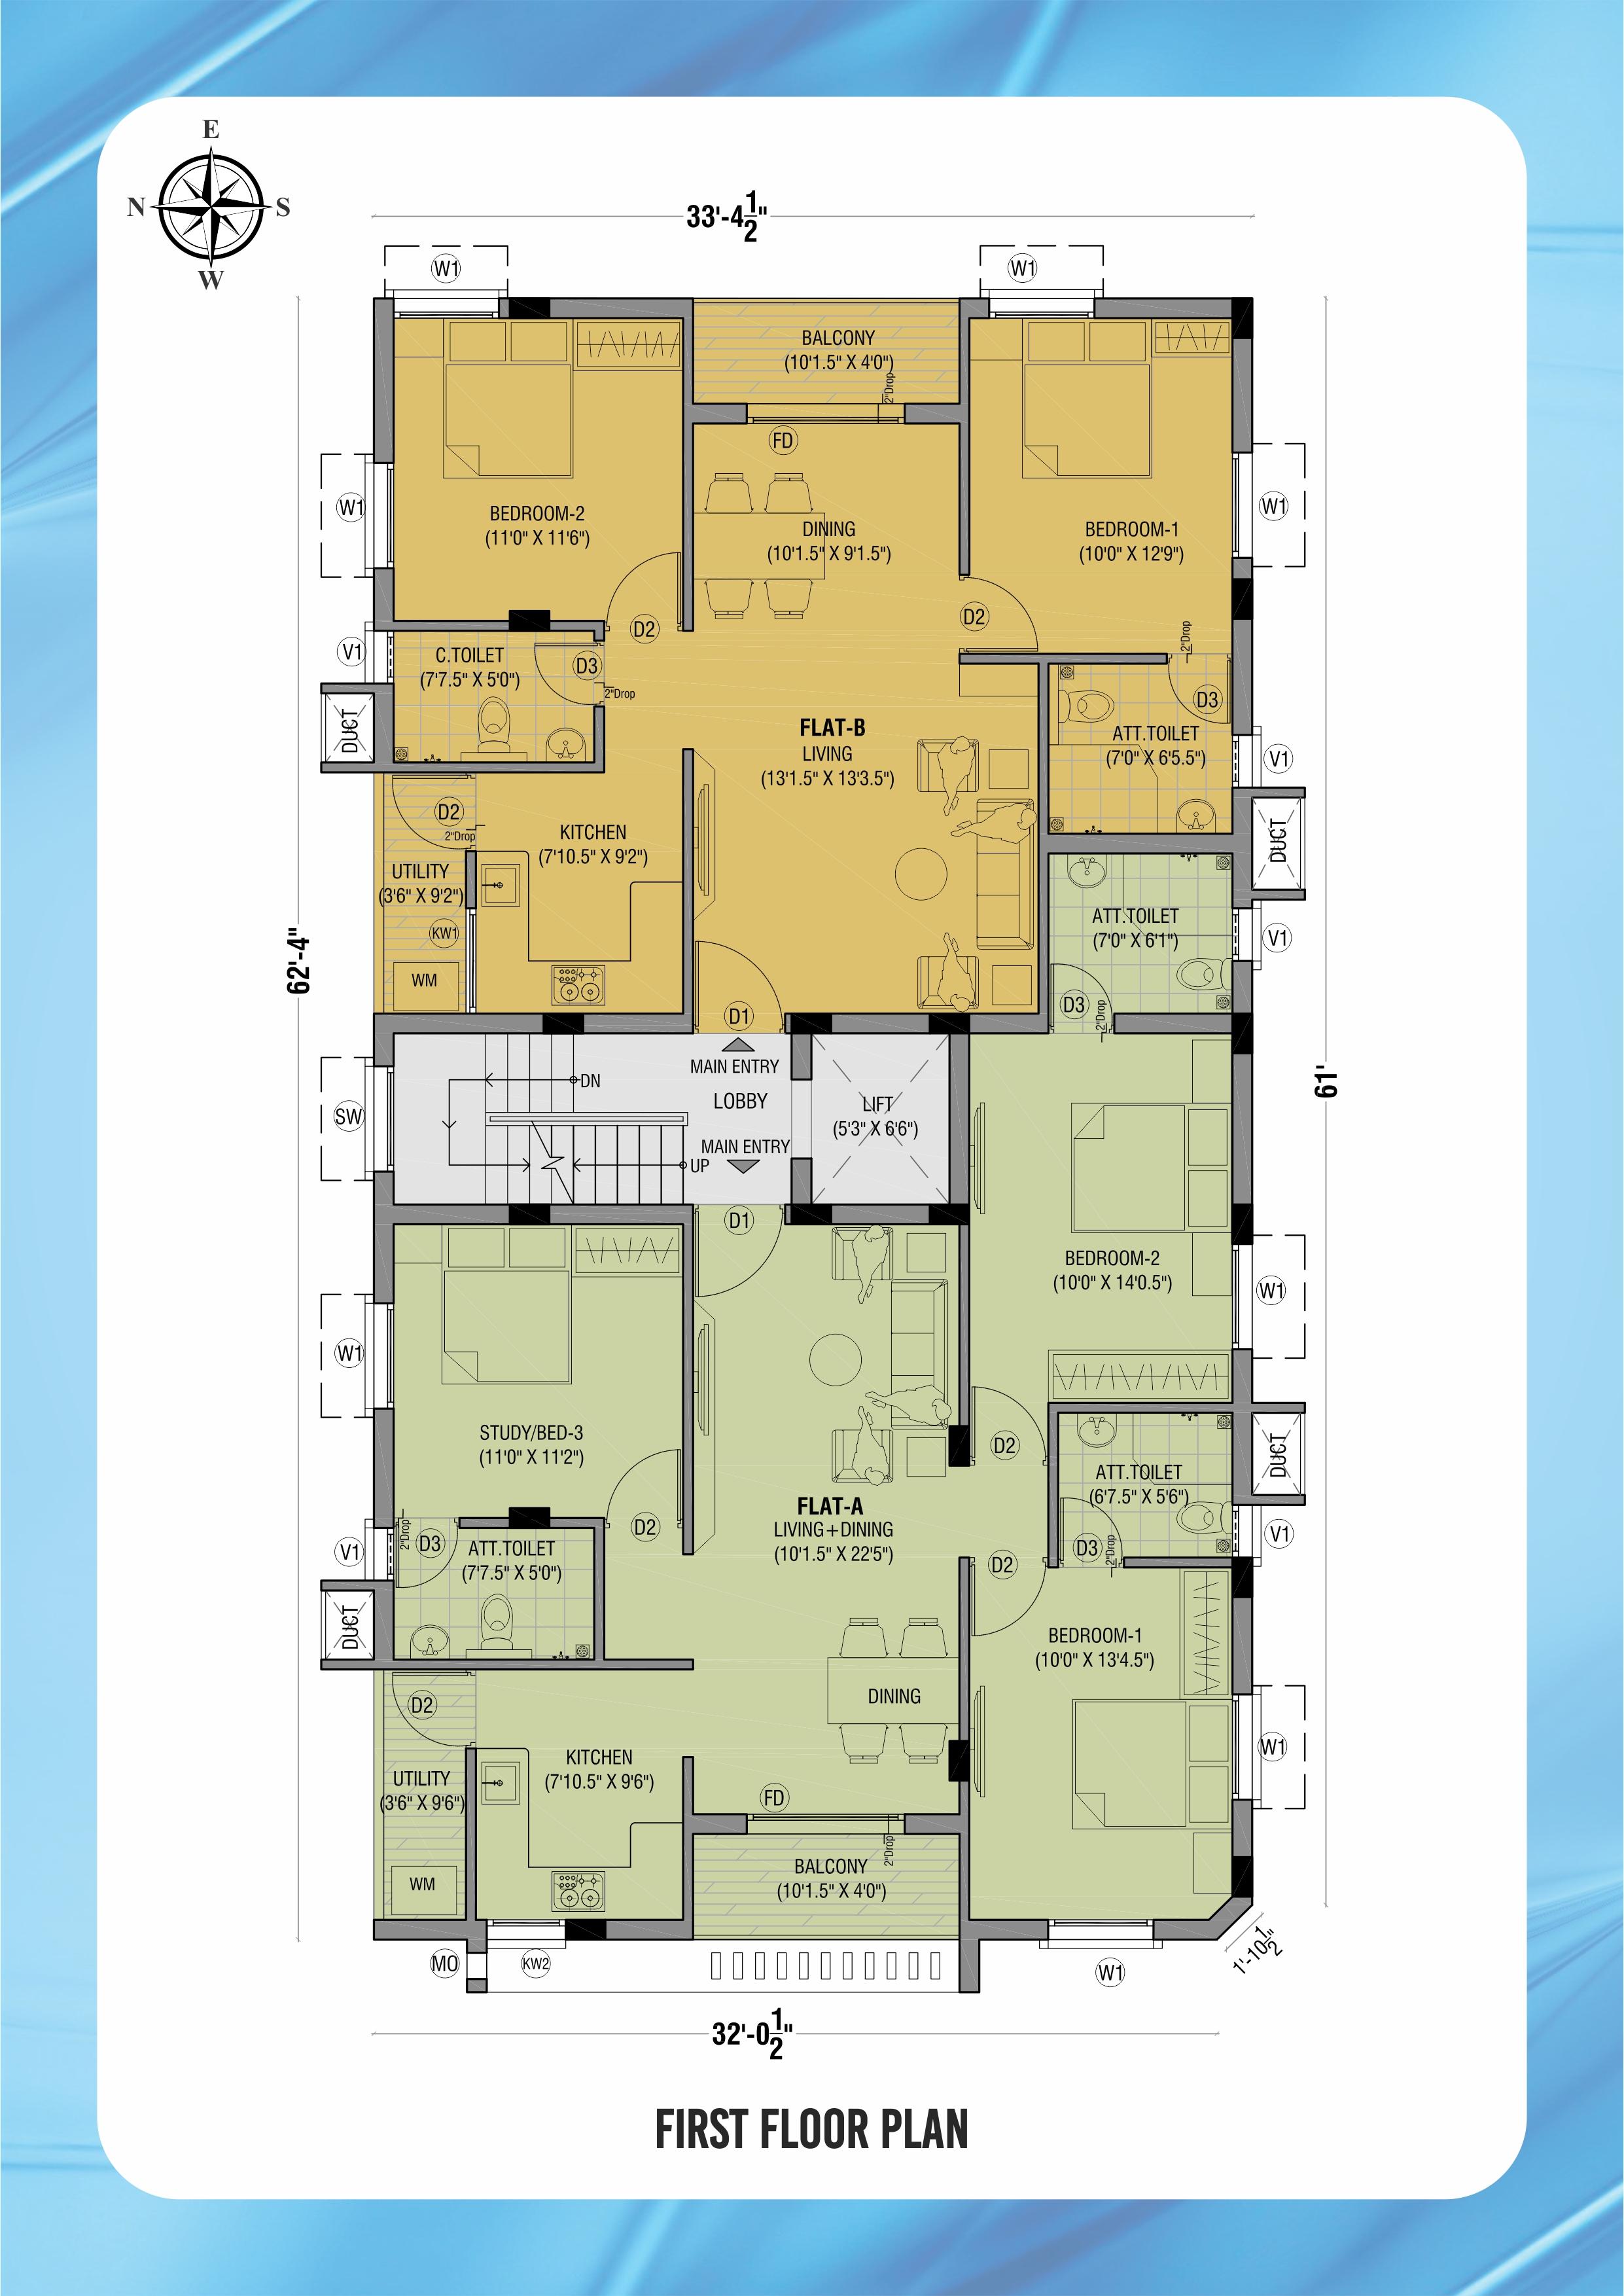 https://www.firmfoundations.in/projects/floorplans/thumbnails/16062001005Firs.jpg